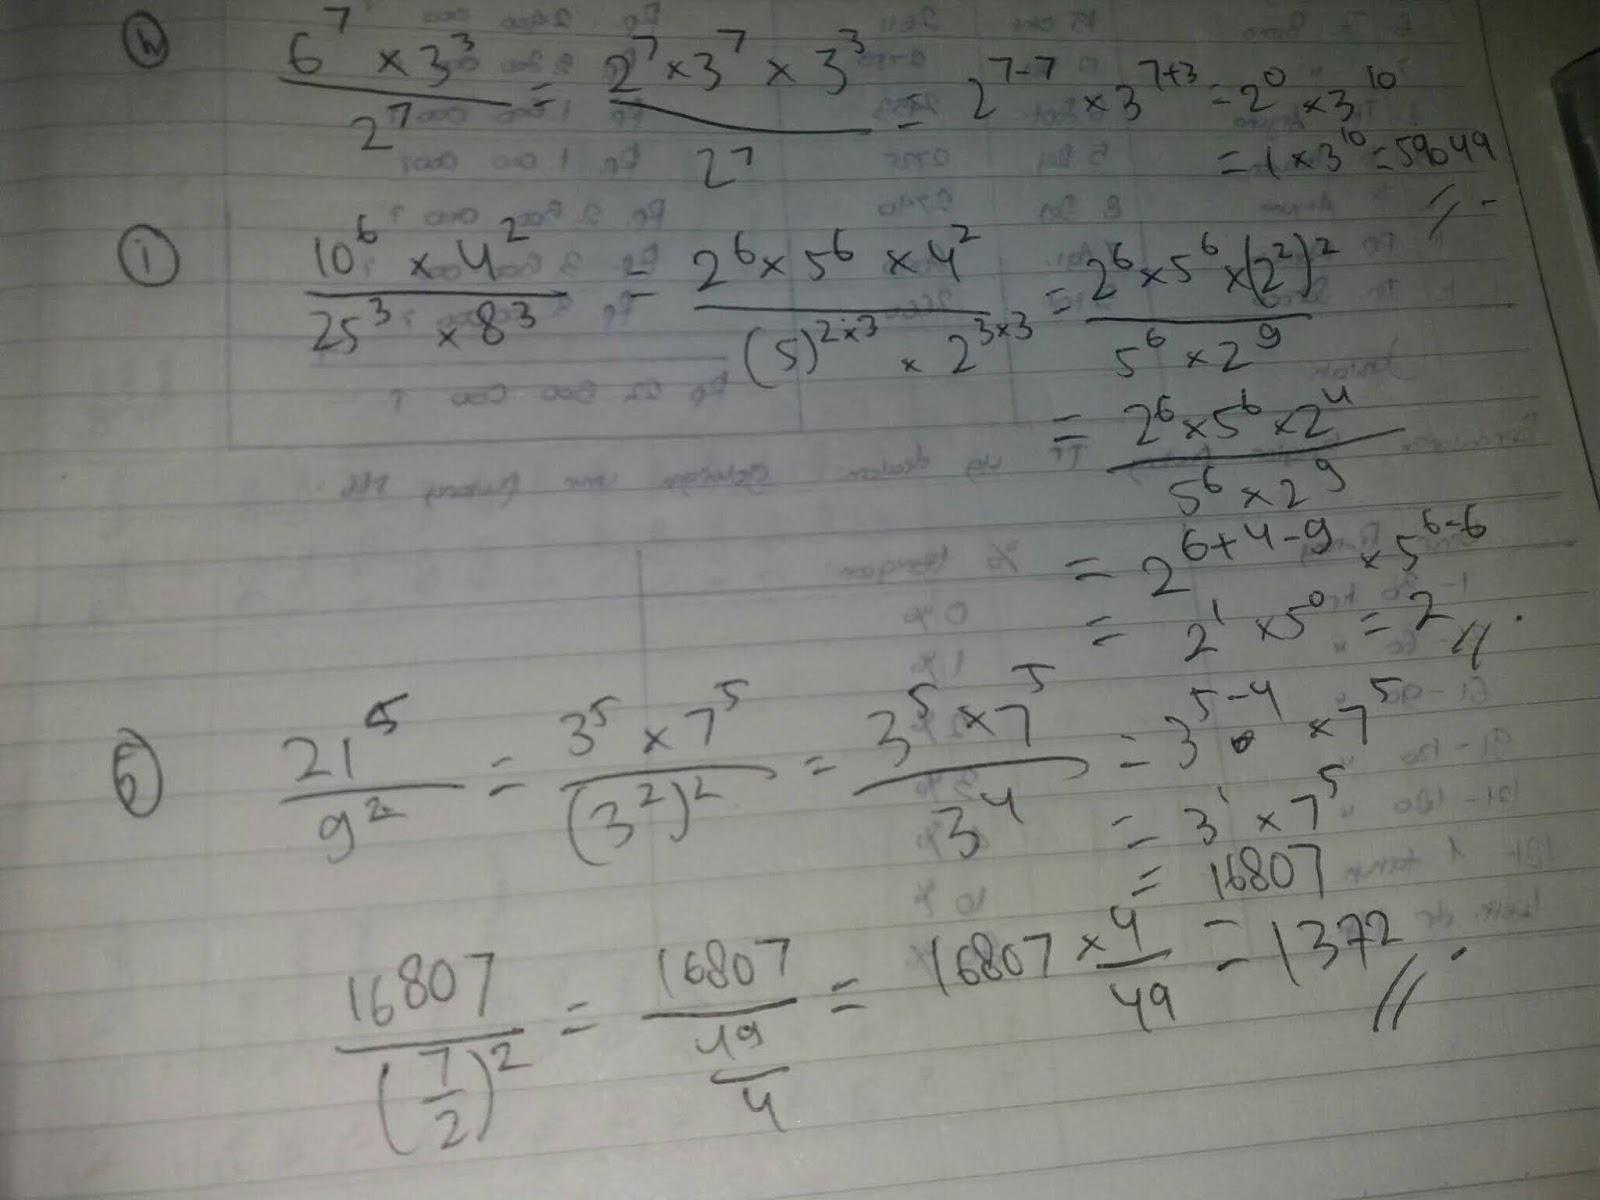 S pangkat 2 per s pangkat 4 × s pangkat 9 per s pangkat 3 = s. Matematika Kelas 9 Latihan 1 3 Halaman 31 Doc Soalkunci